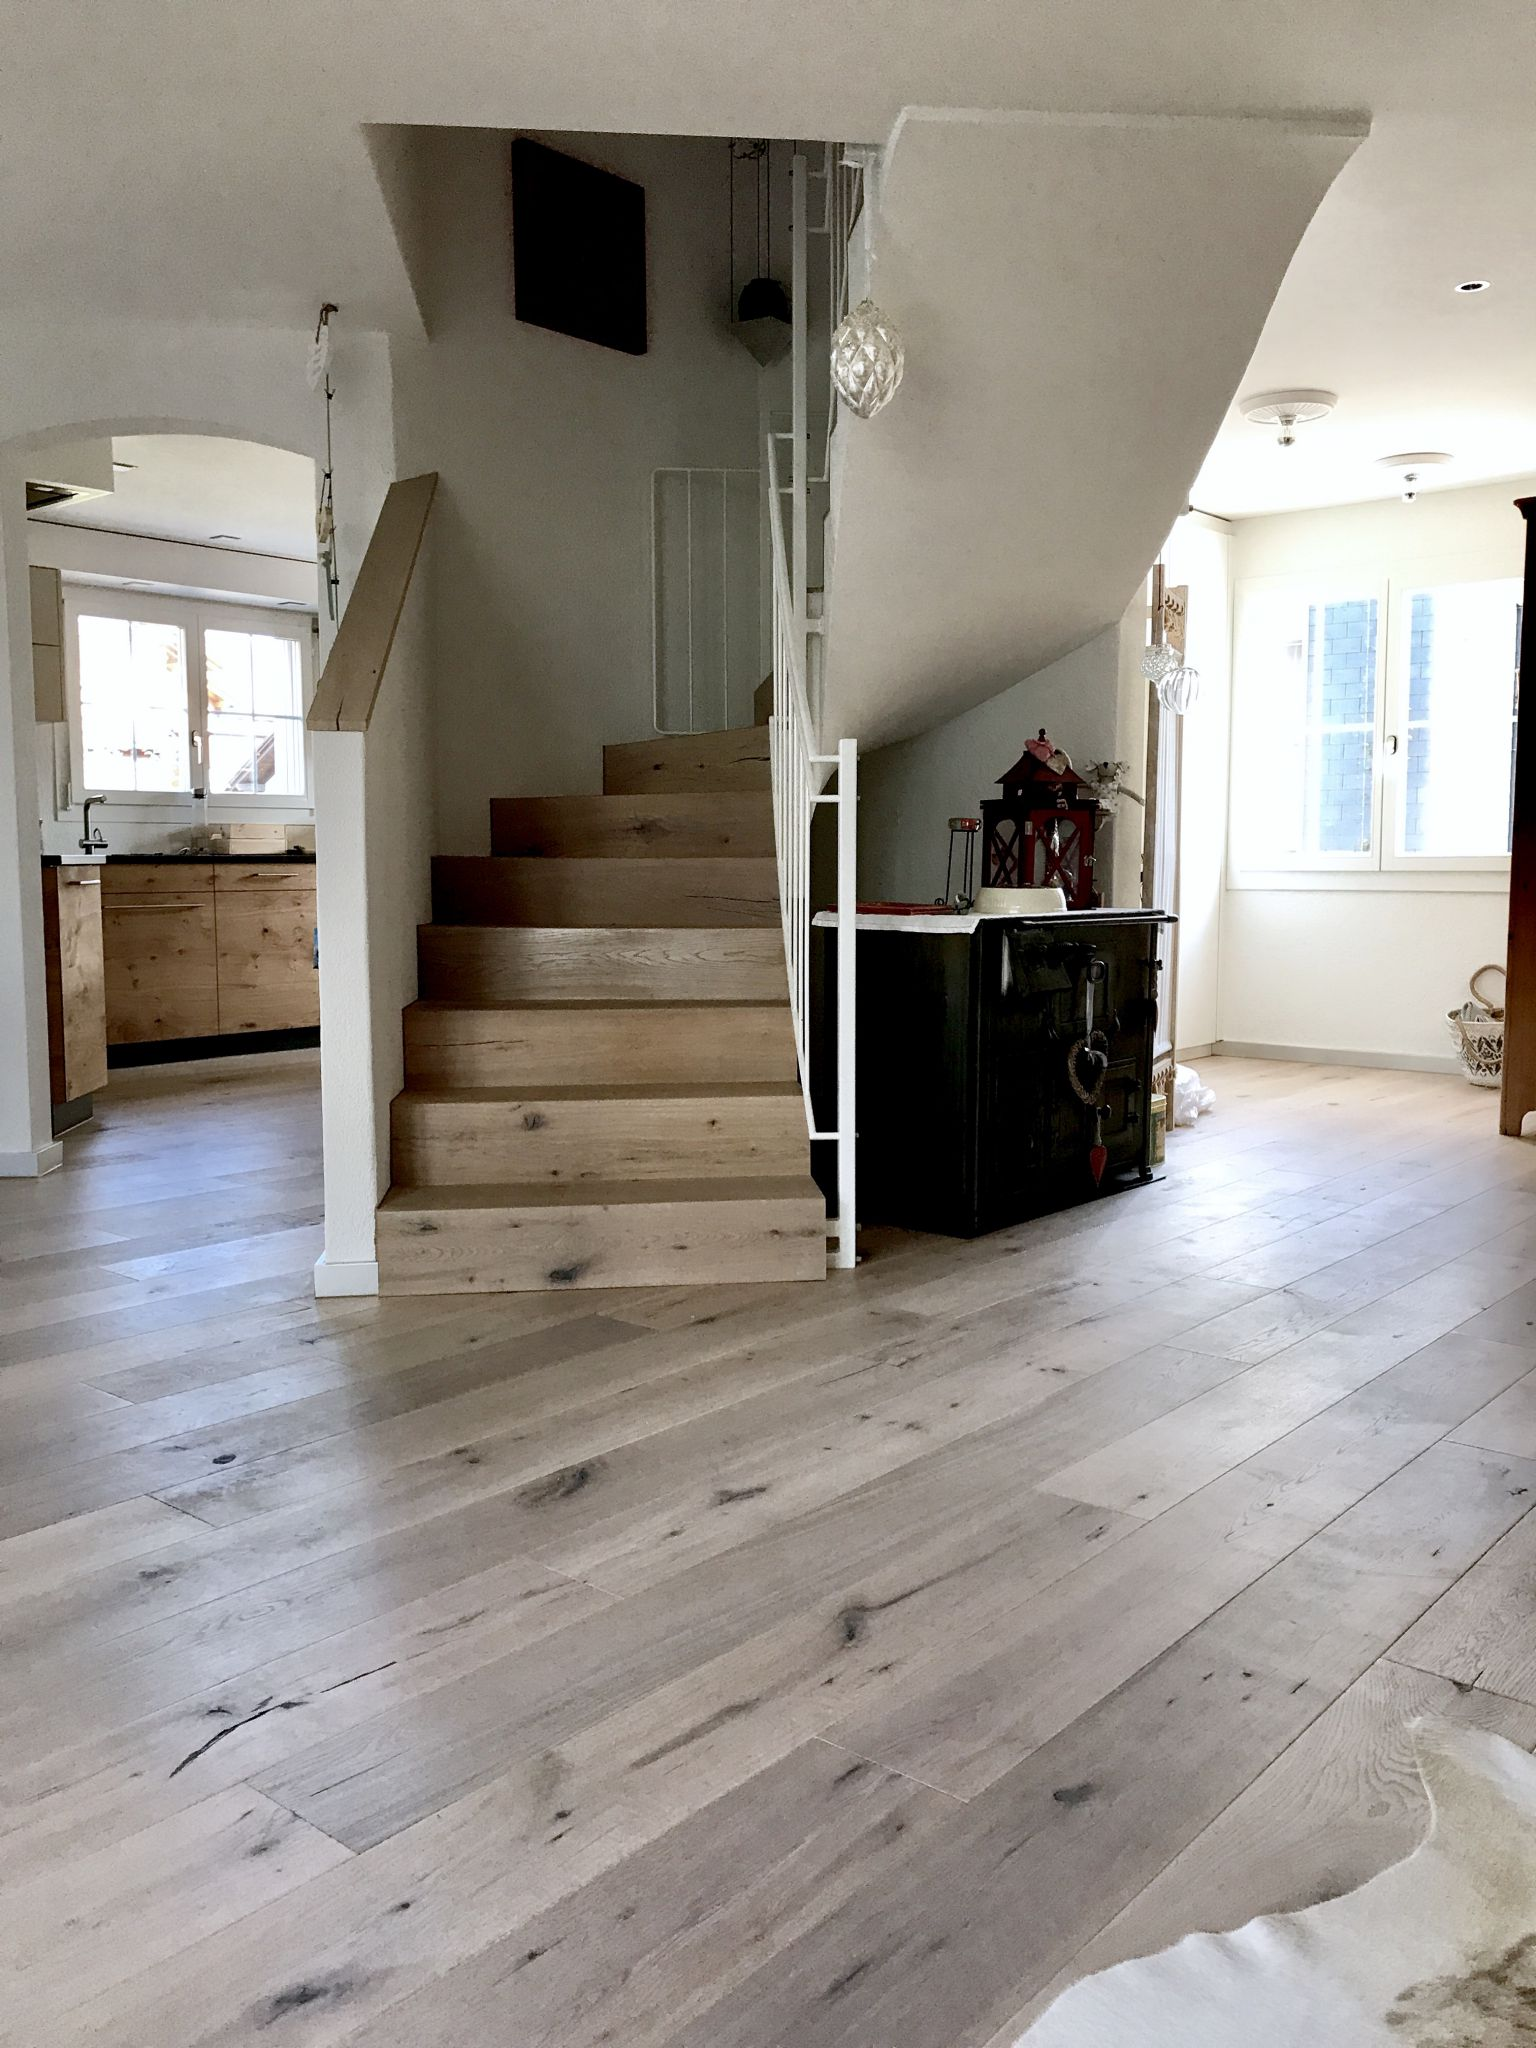 parkett in k che und bad nobilia k che magnolia hochglanz ikea kuche mobel selber bauen aus. Black Bedroom Furniture Sets. Home Design Ideas